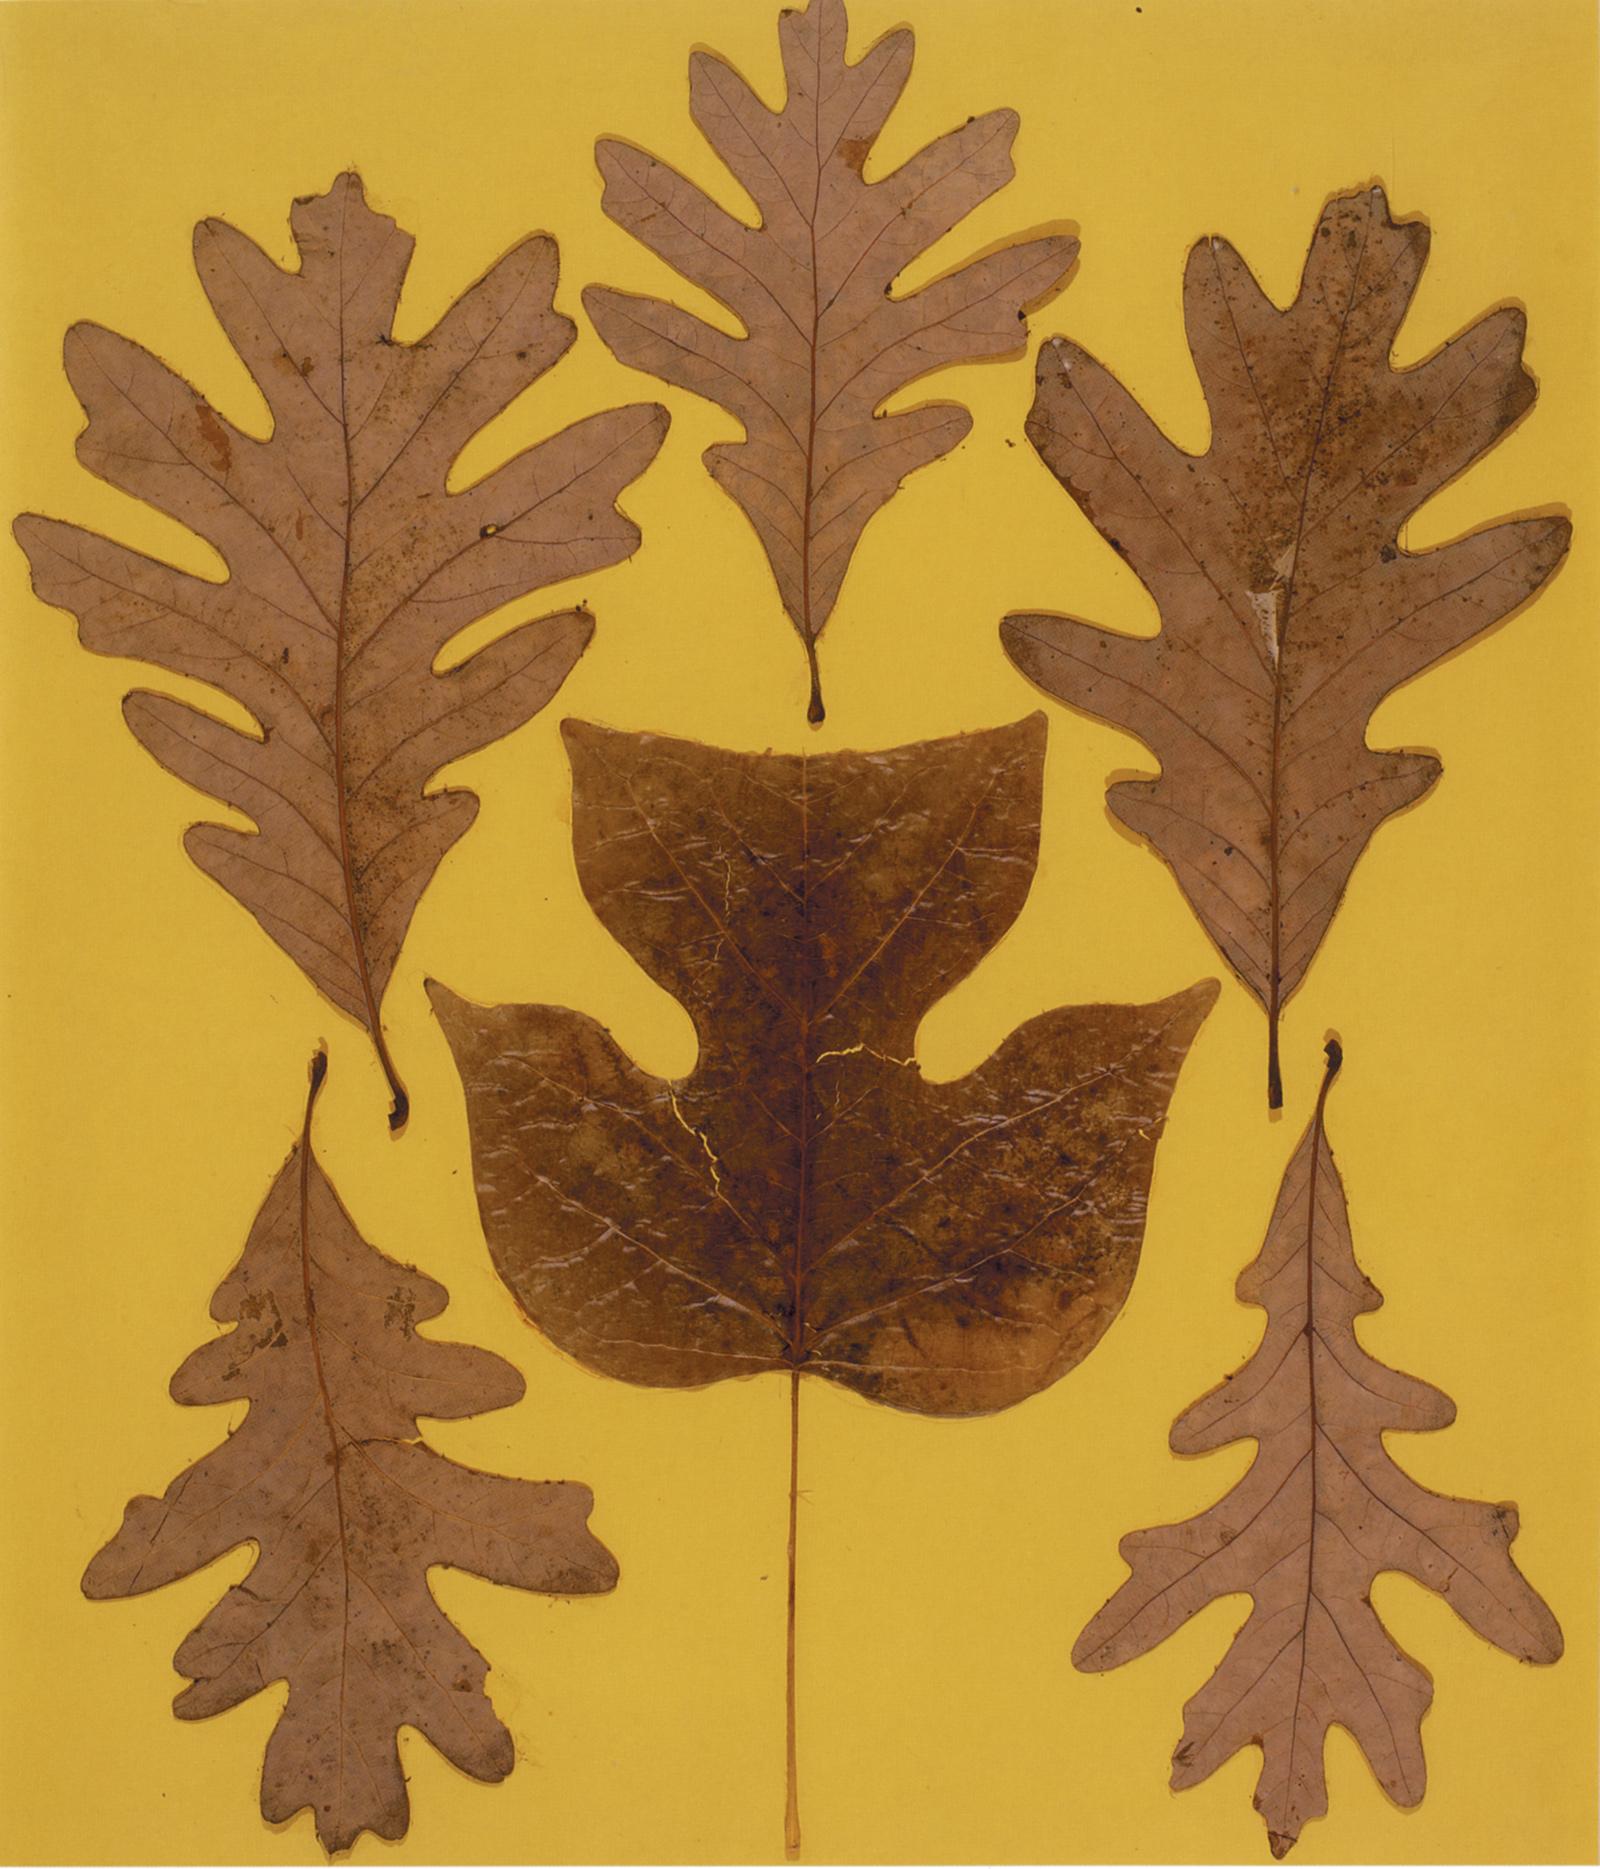 Josef Albers: Leaf Study IX, circa 1940